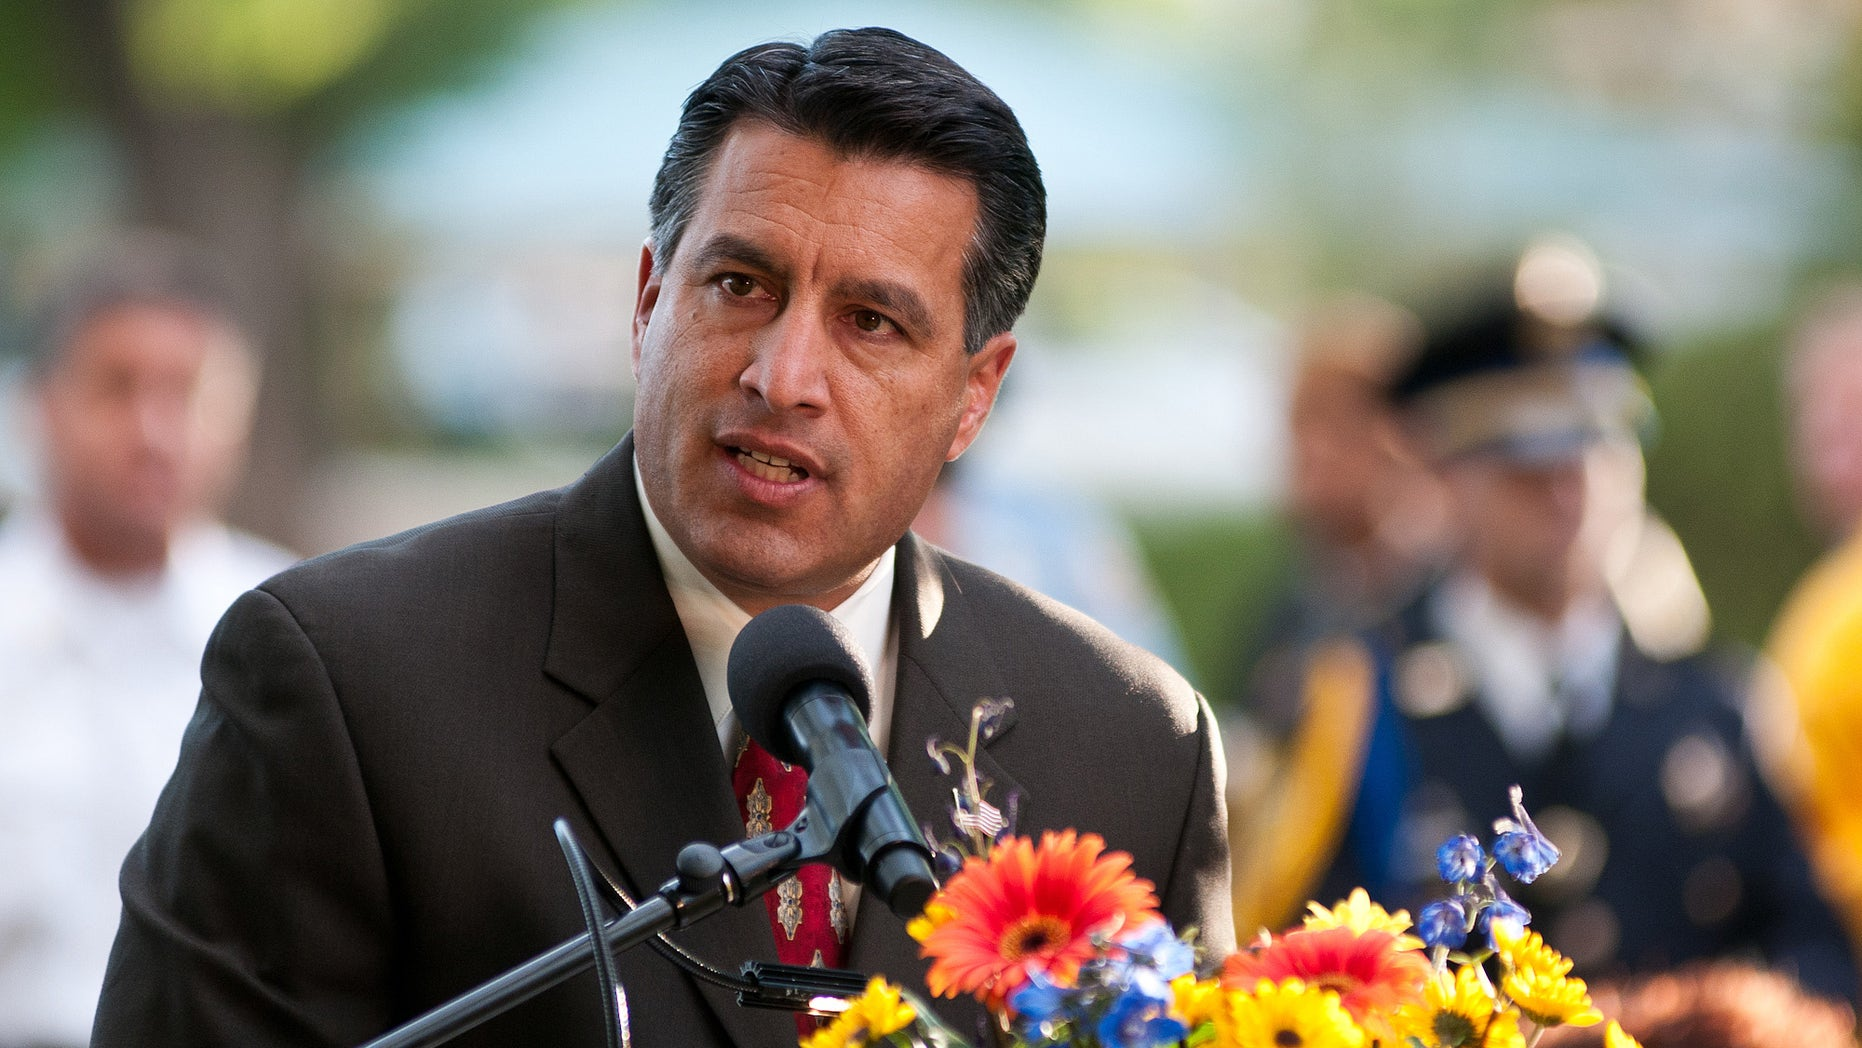 Nevada Gov. Brian Sandoval addressing the 2012 Republican convention in Tampa.